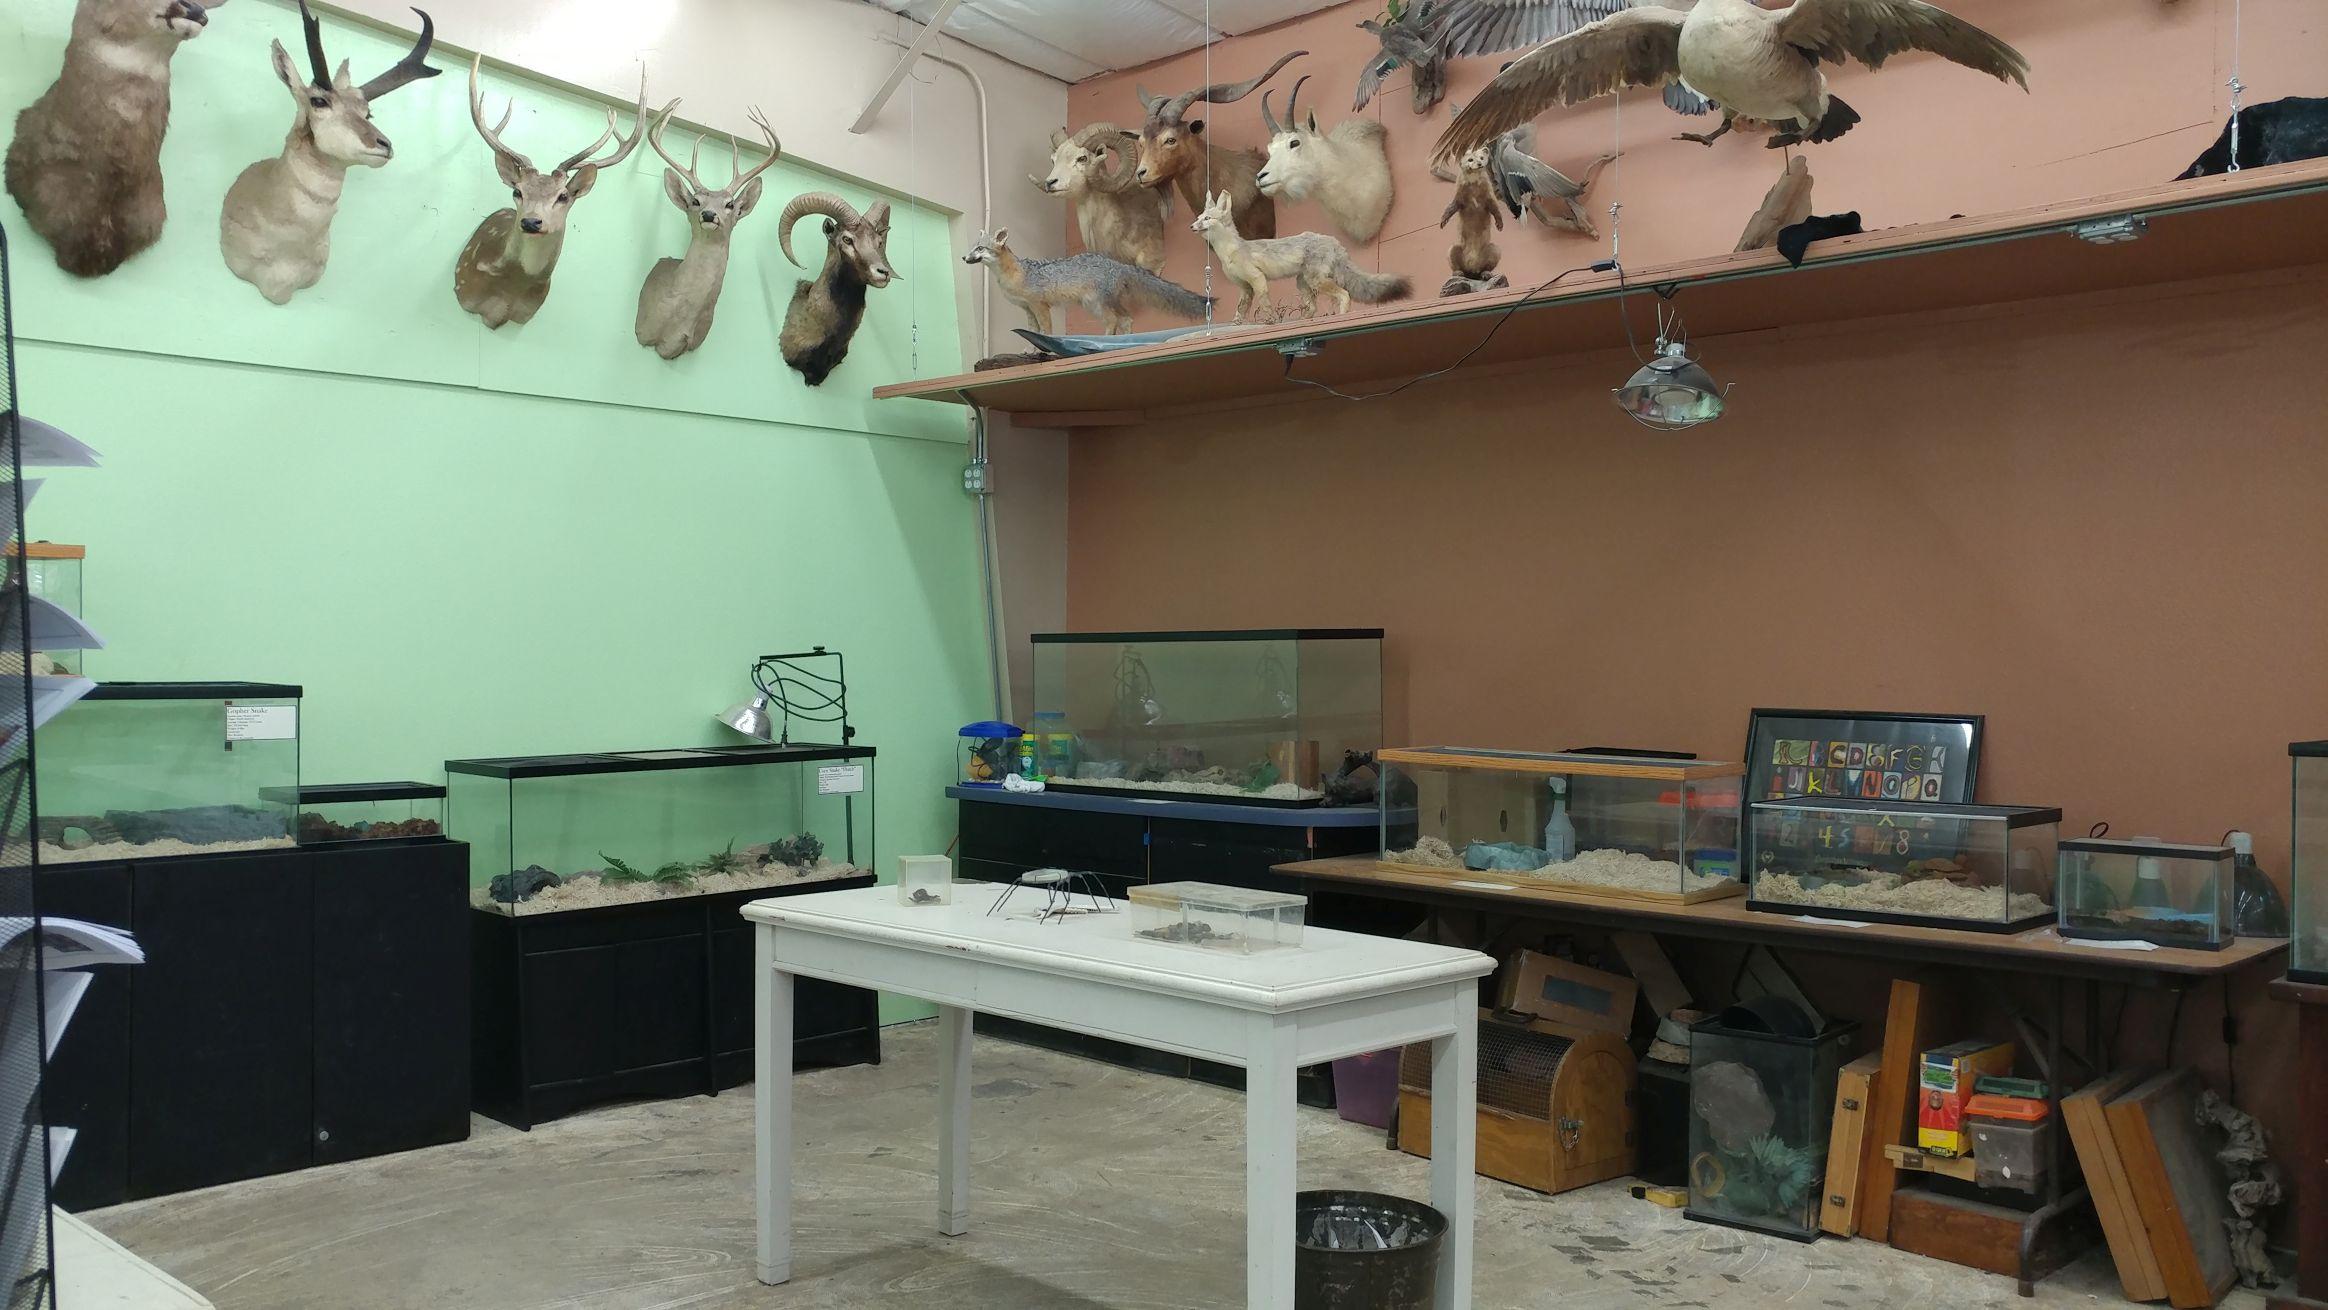 jmdc gift shop and critter corner